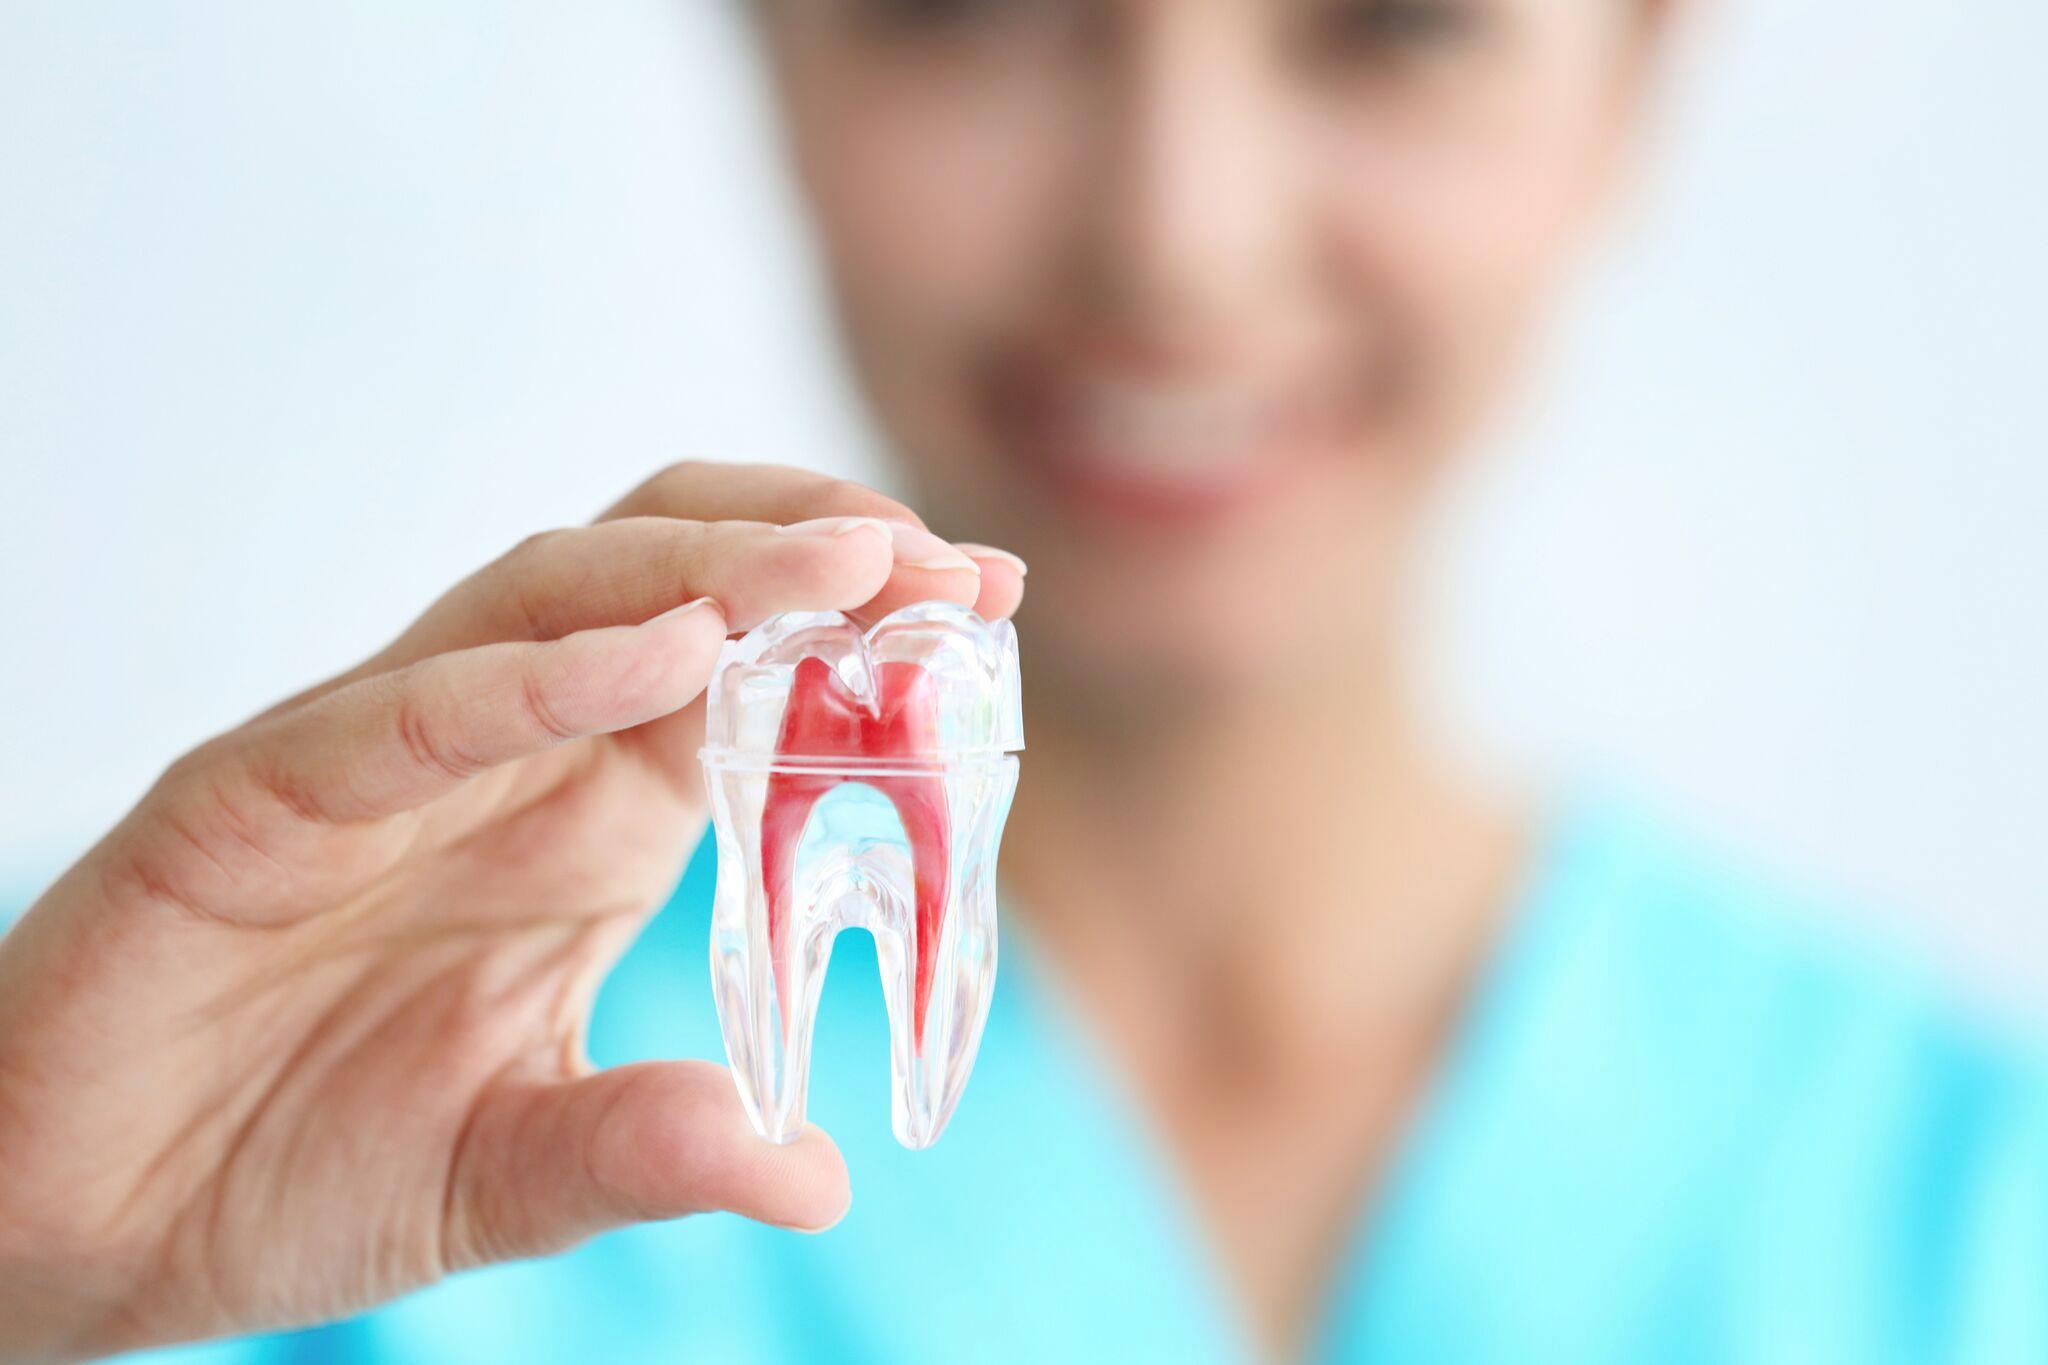 https://dentalstudioturkey.com/wp-content/uploads/2021/02/Root-Canal-Treatment2.jpg